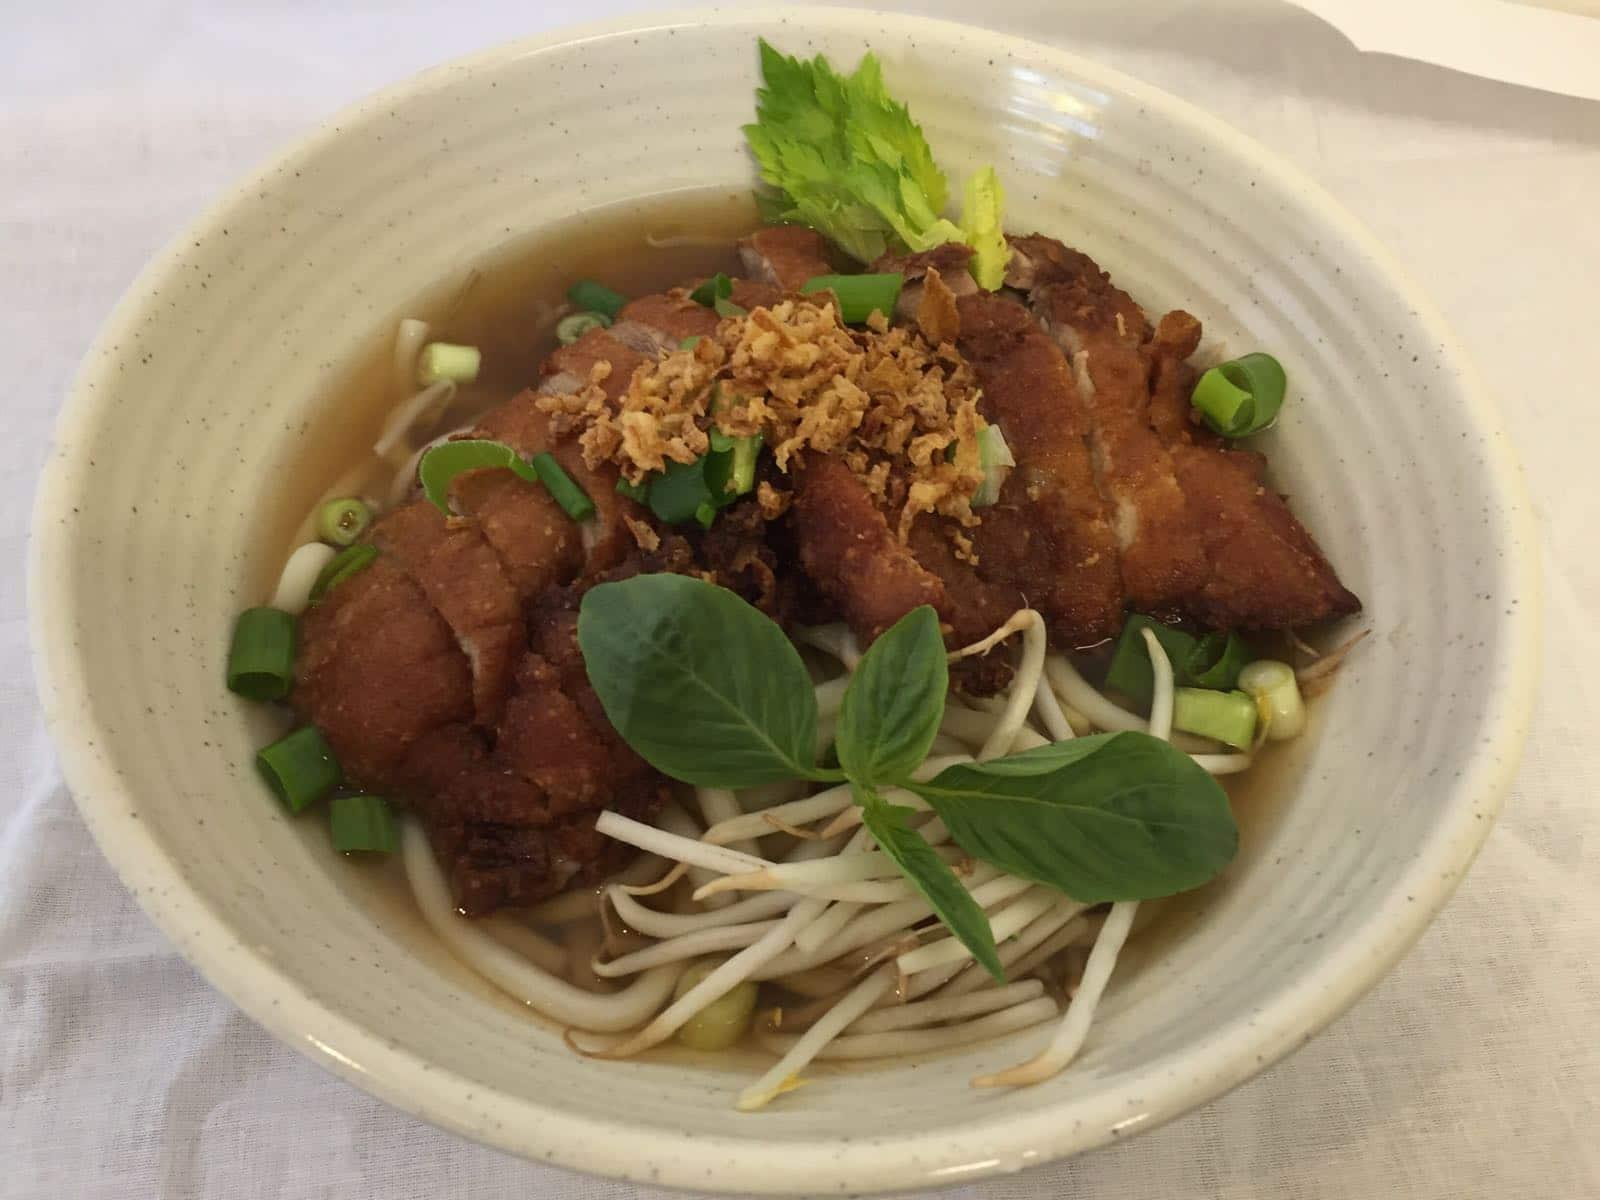 REZEPTE Archive - Pi-Nong Authentische Thai-Küche